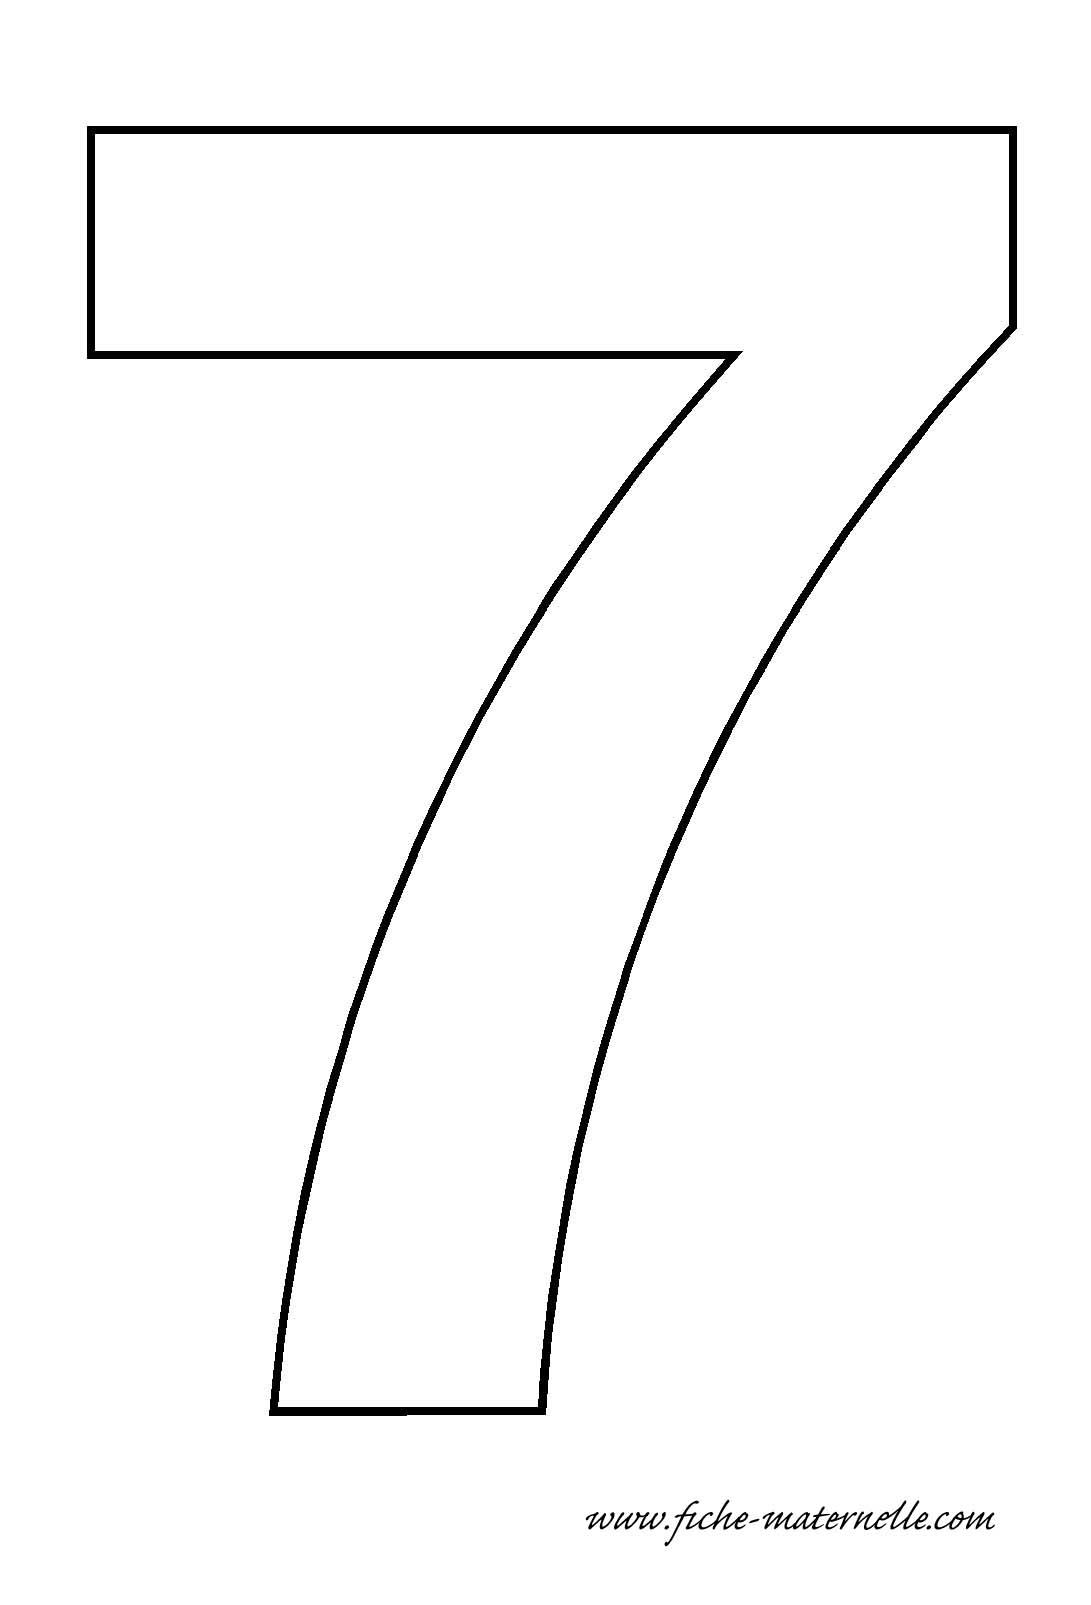 photo regarding Large Printable Numbers called heavy printable quantities PrintableTemplates